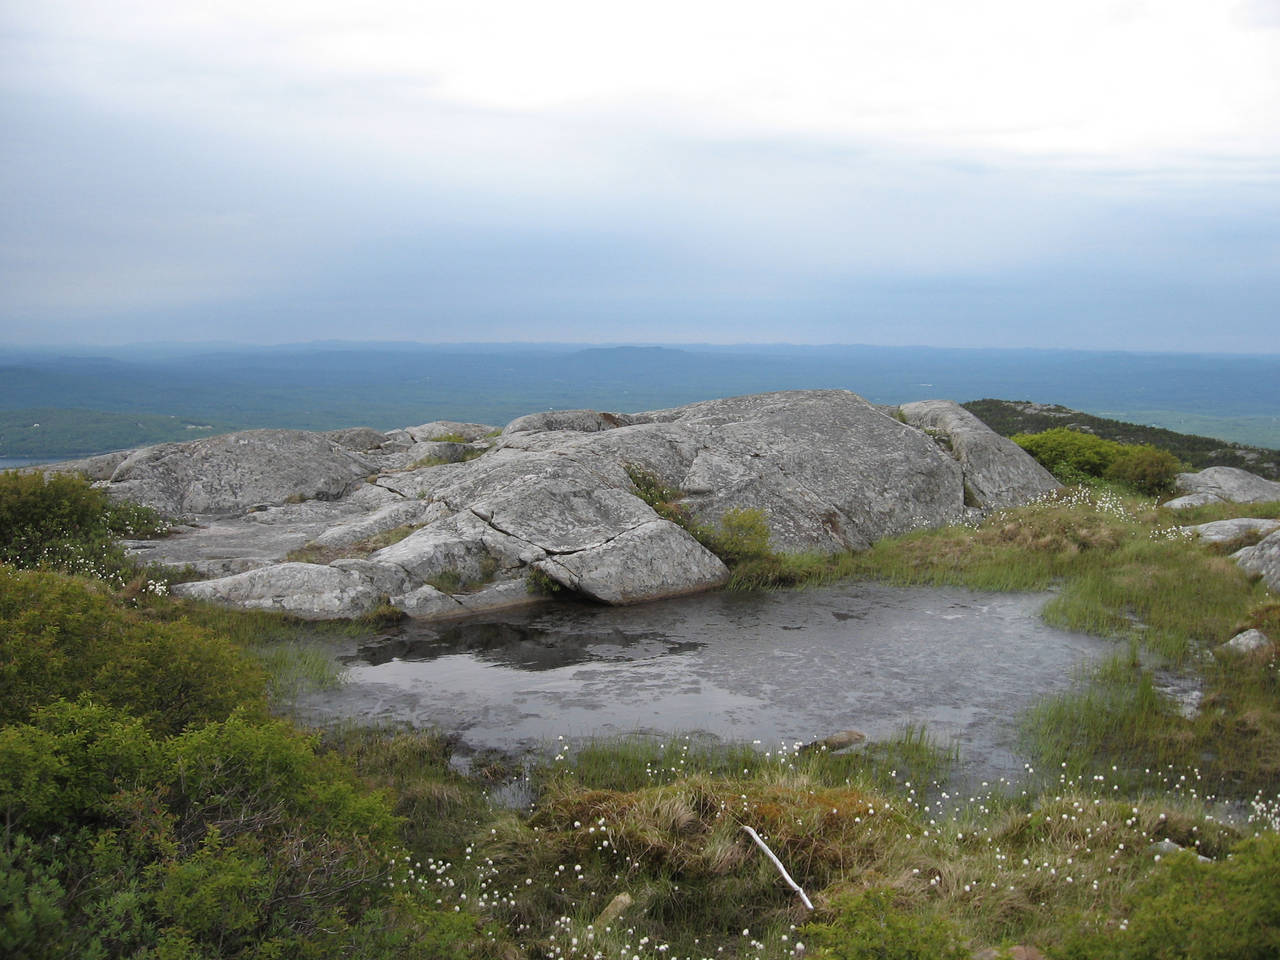 Mt. Monadnock 2 by dseomn